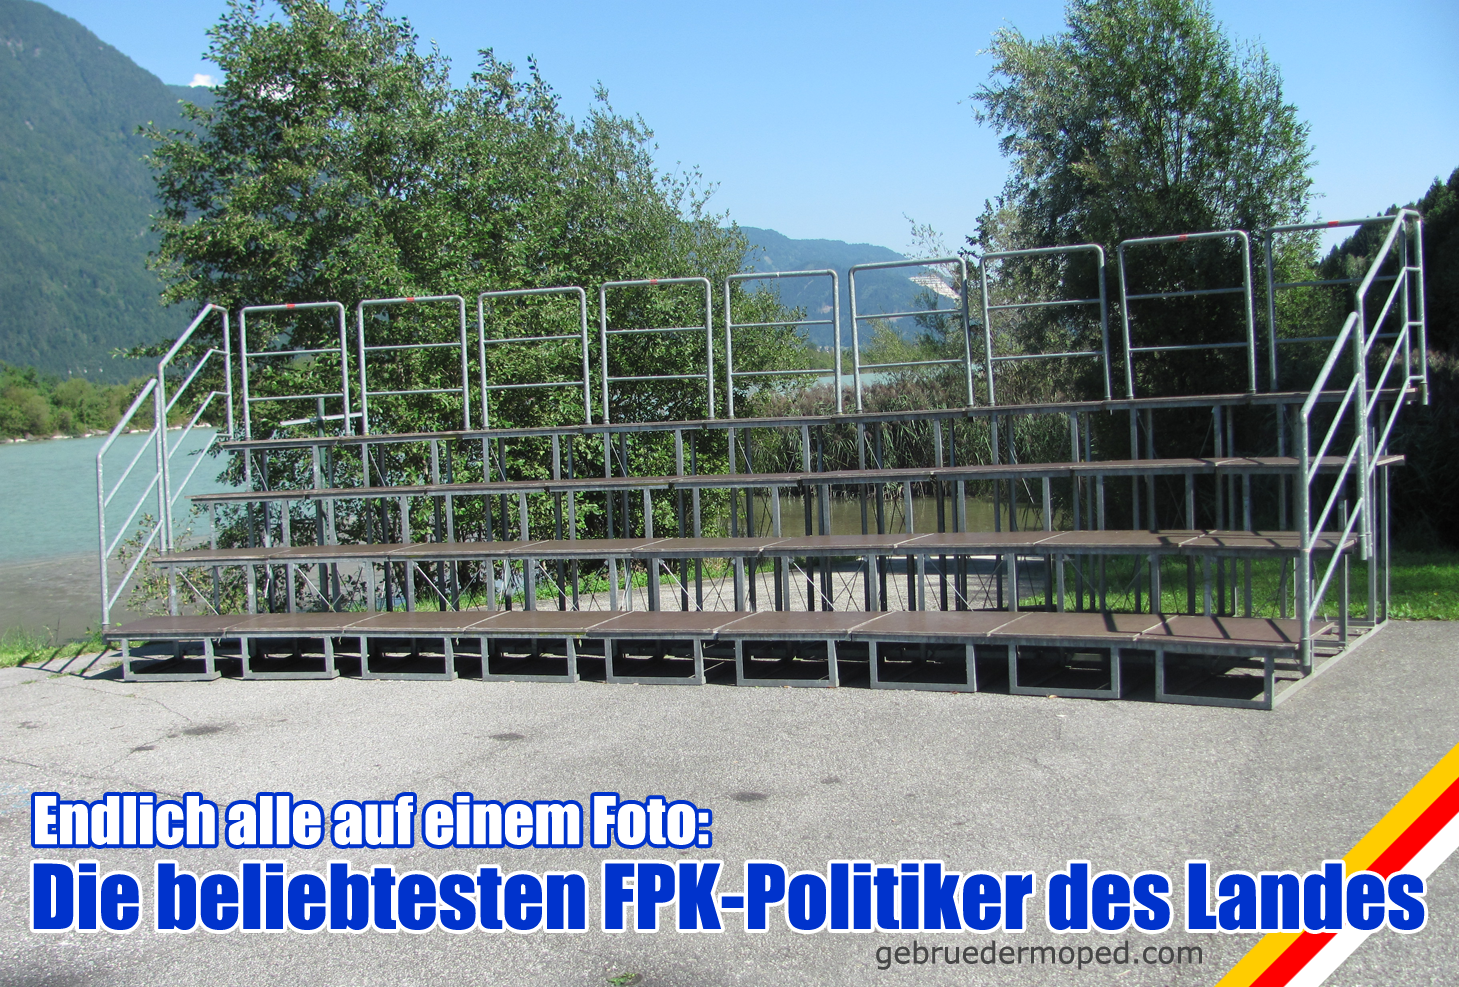 Die beliebtesten FPK-Politiker des Landes